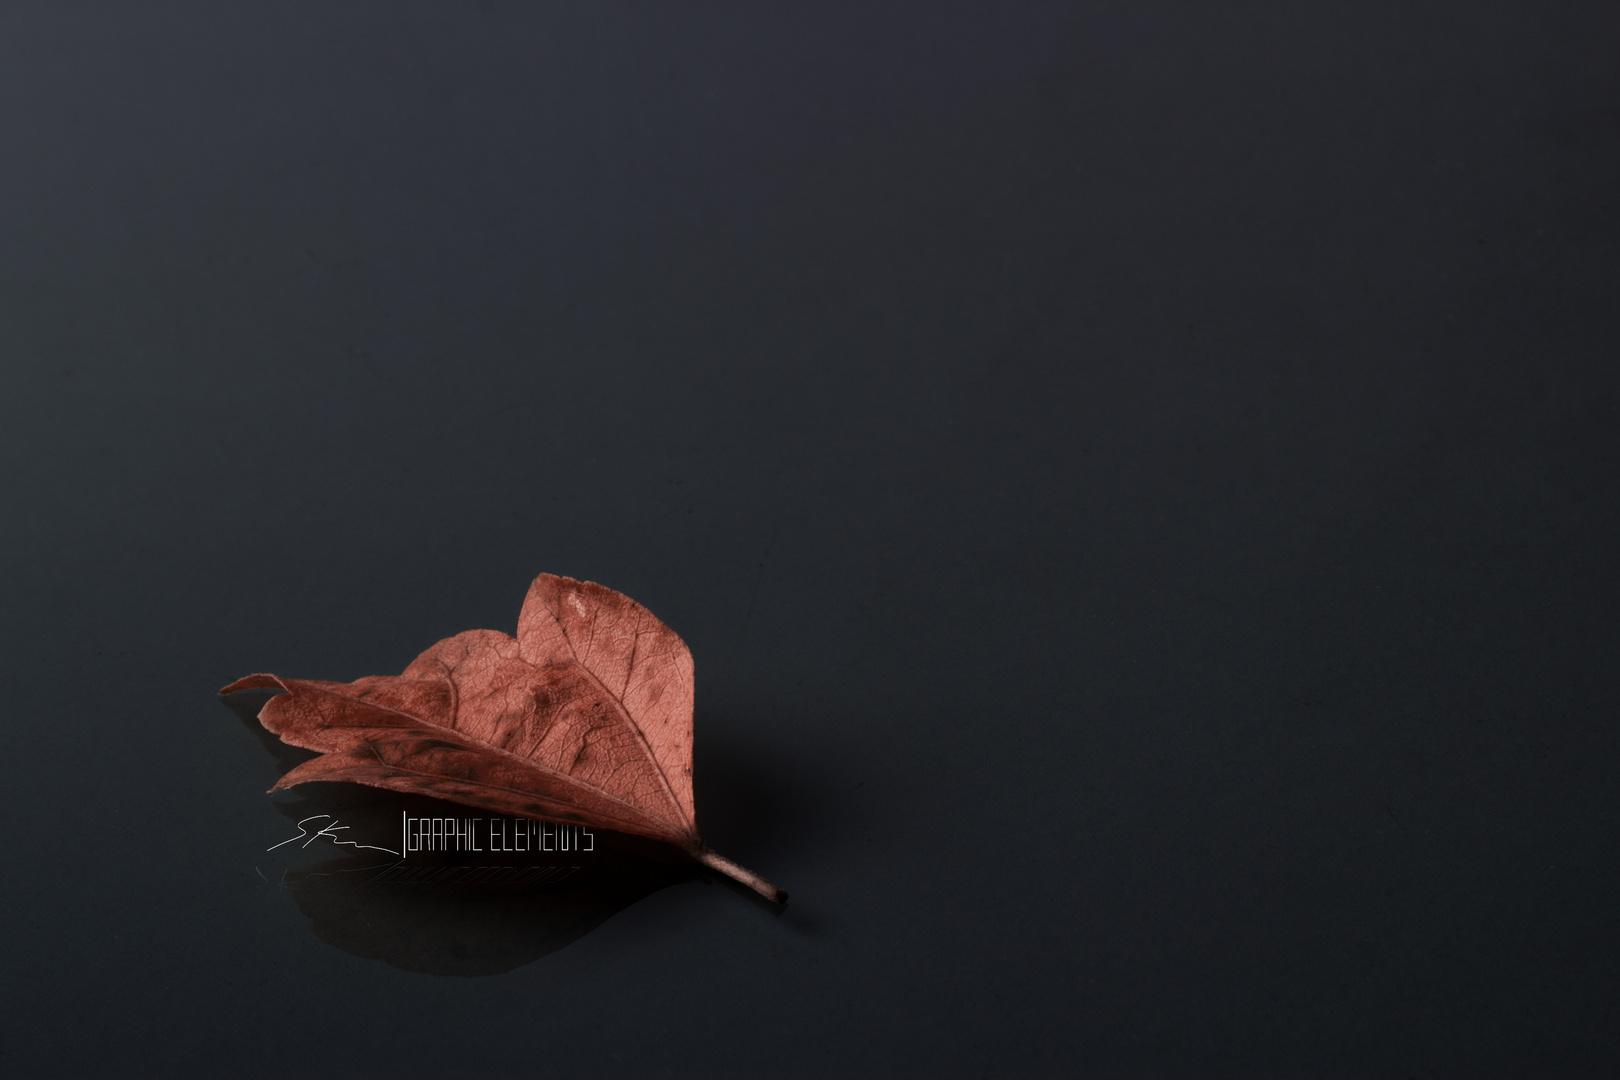 Herbst|Blatt